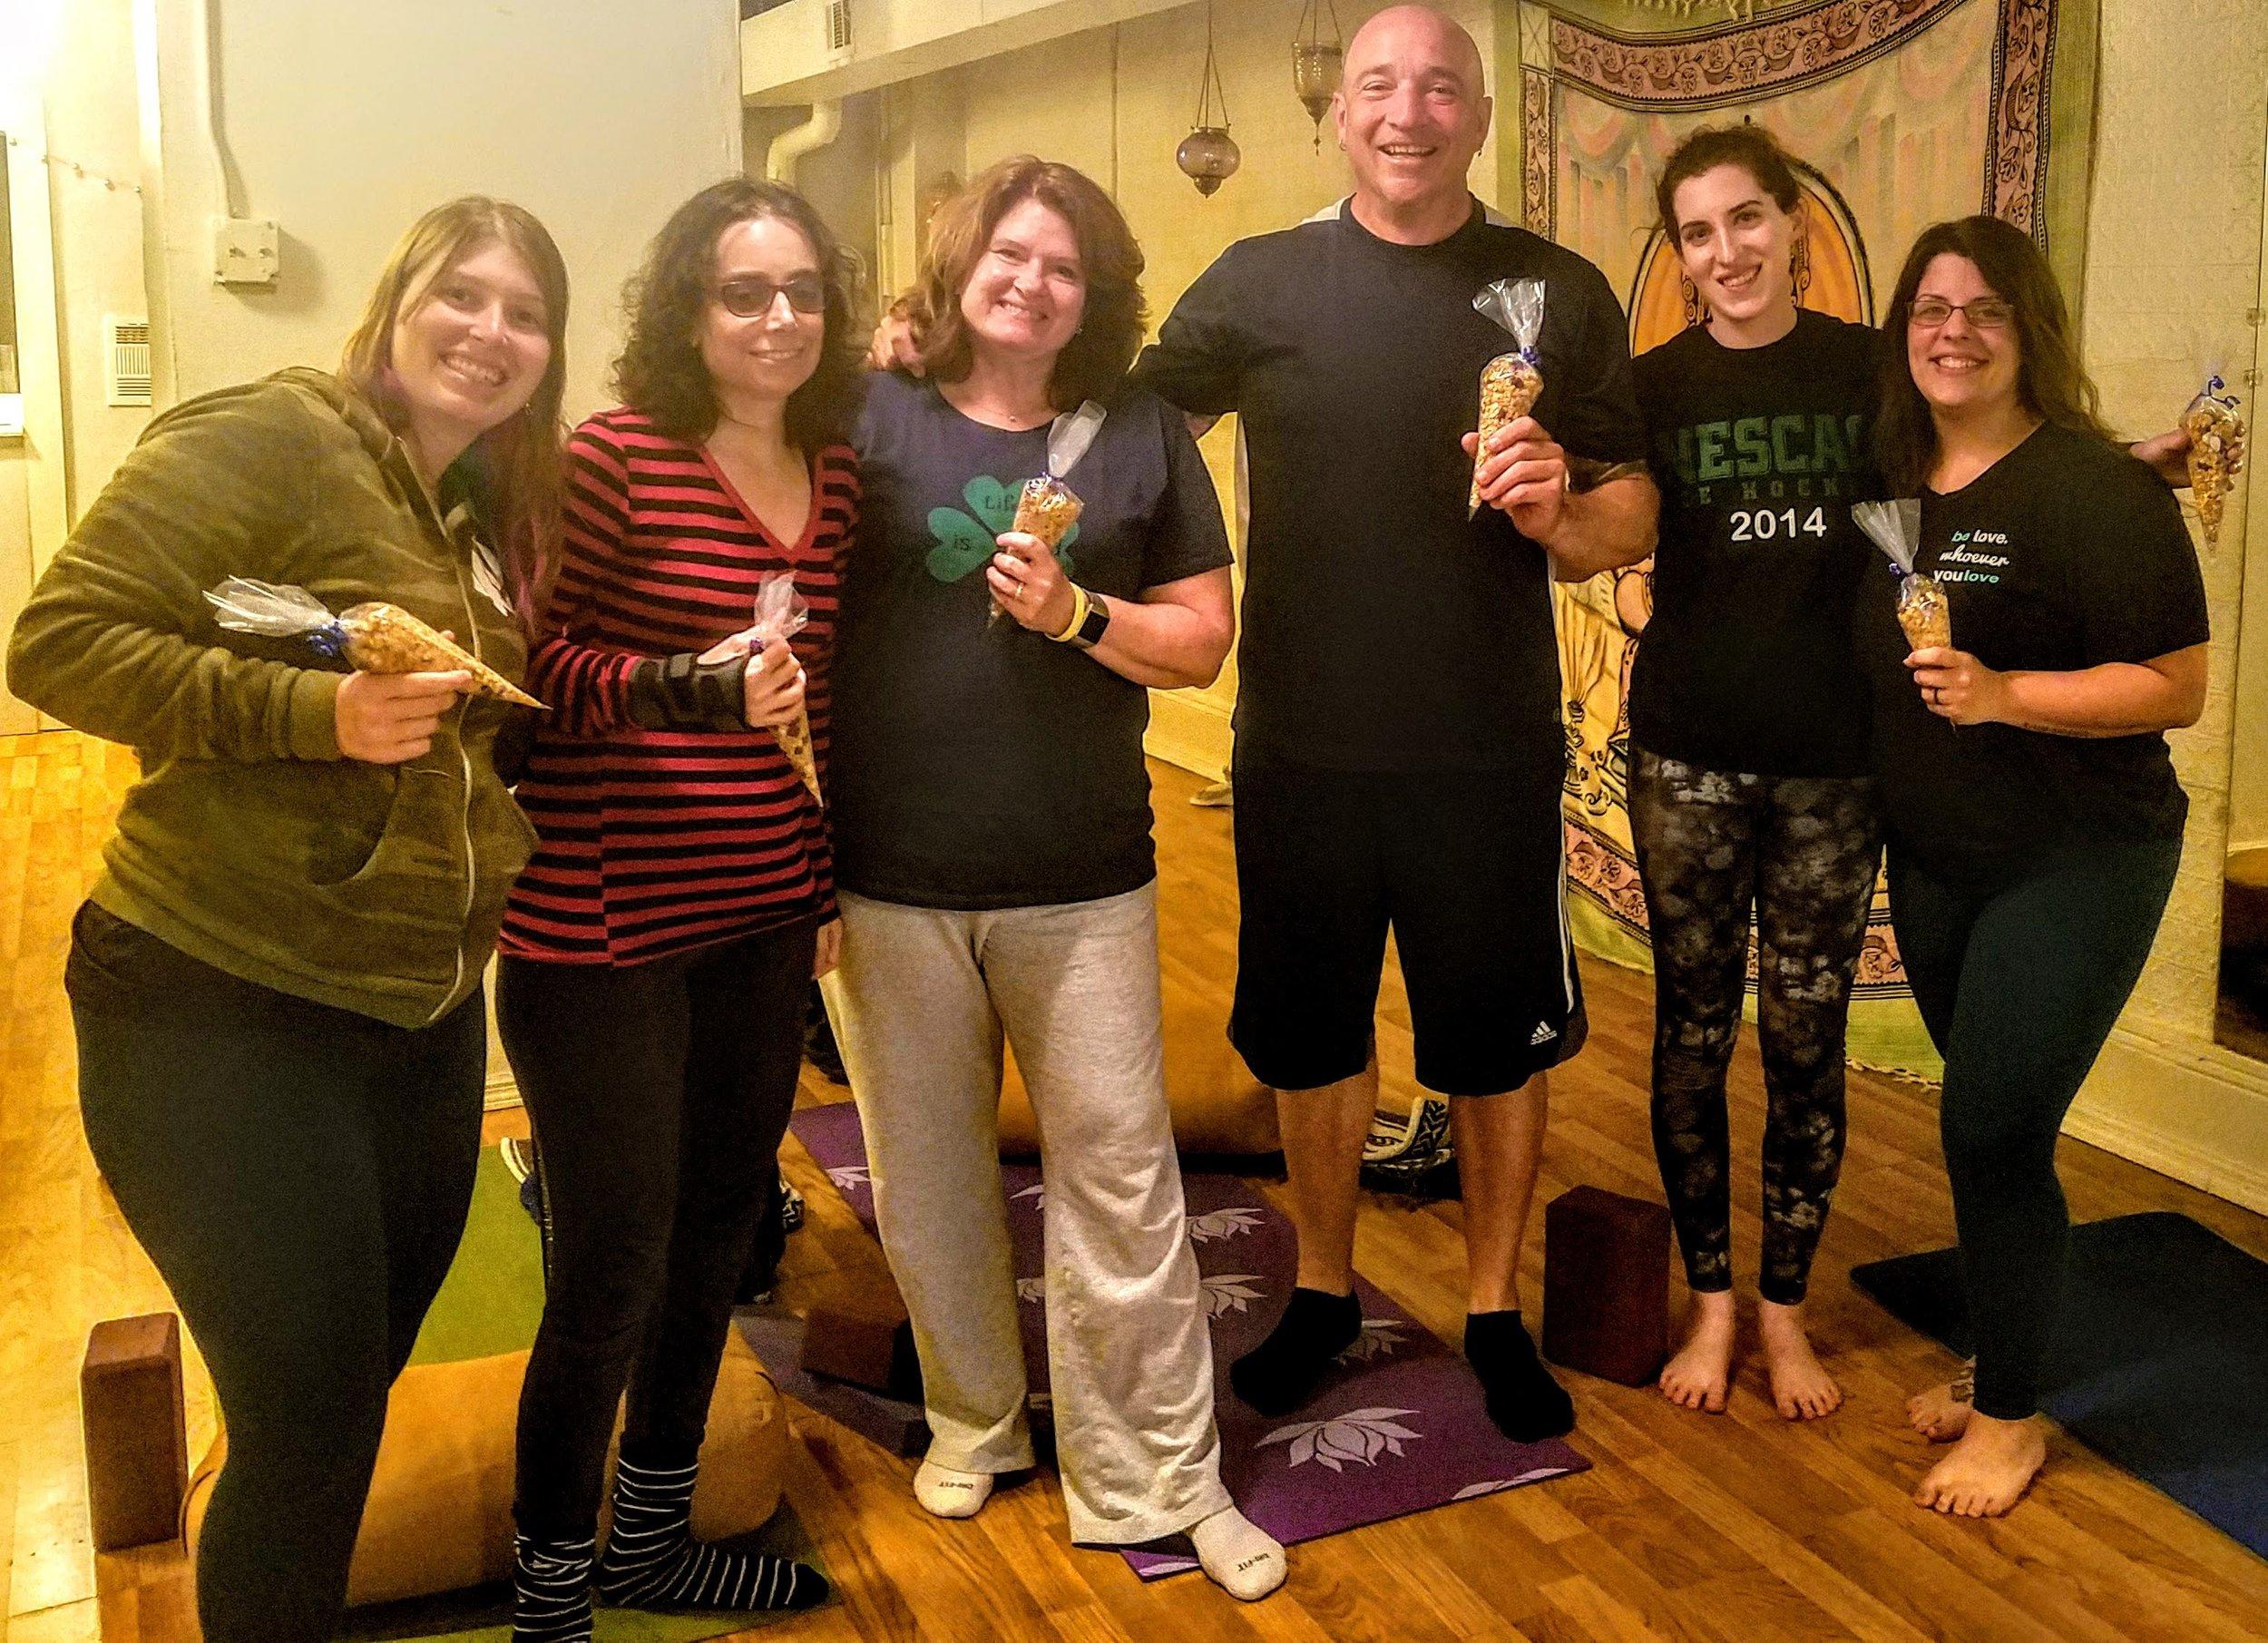 Holding crunchy granola on the last day of LYB Yoga